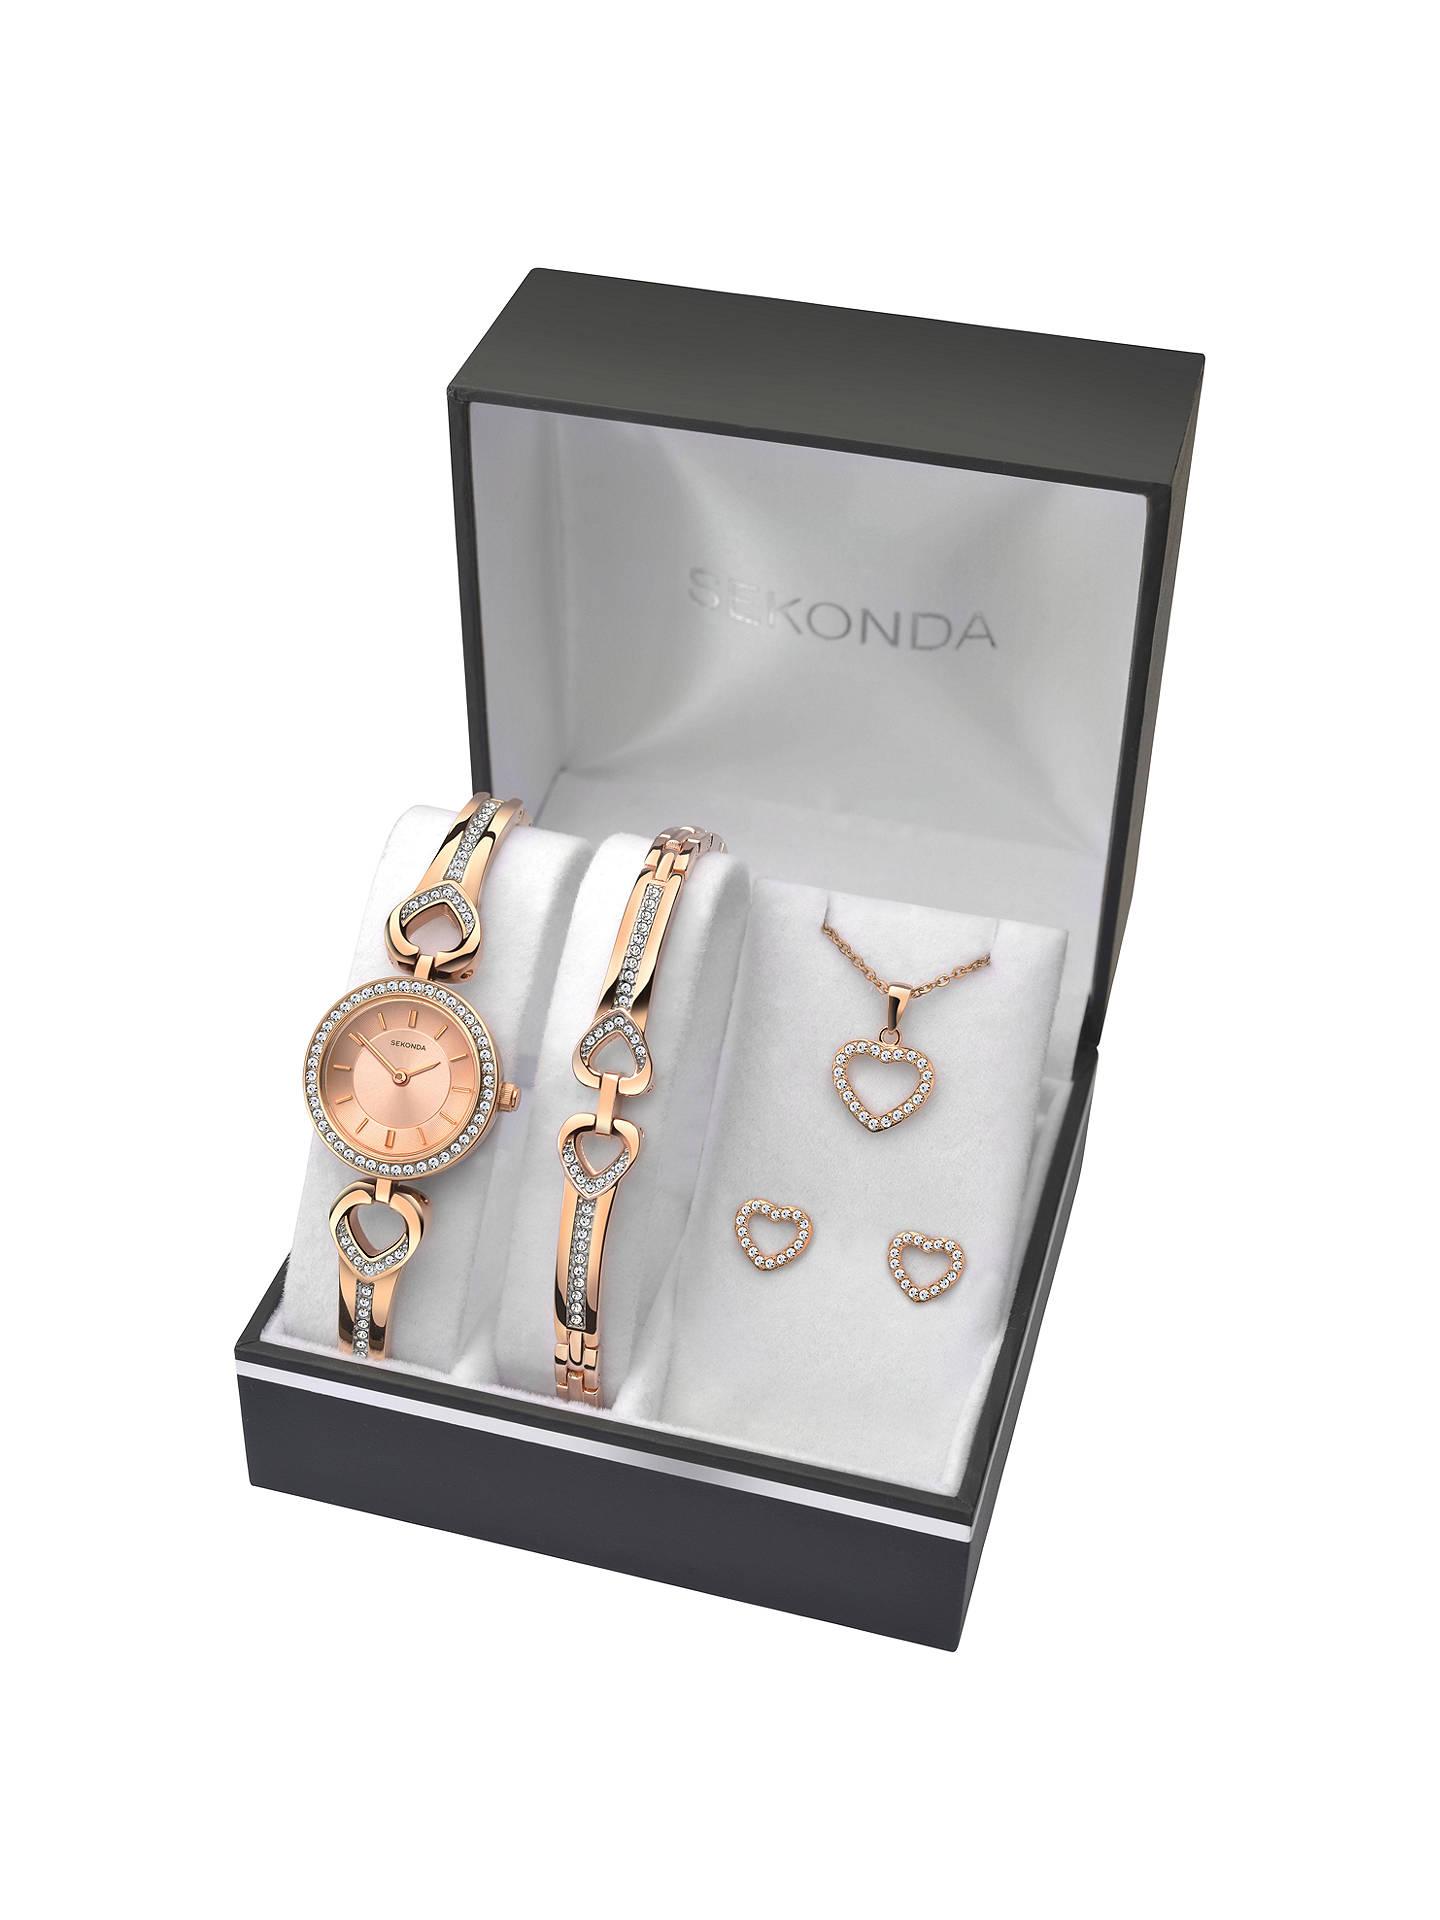 Sekonda 2363g Women S Jewellery Strap Watch Bracelet Pendant Necklace And Earrings Gift Set Rose Gold